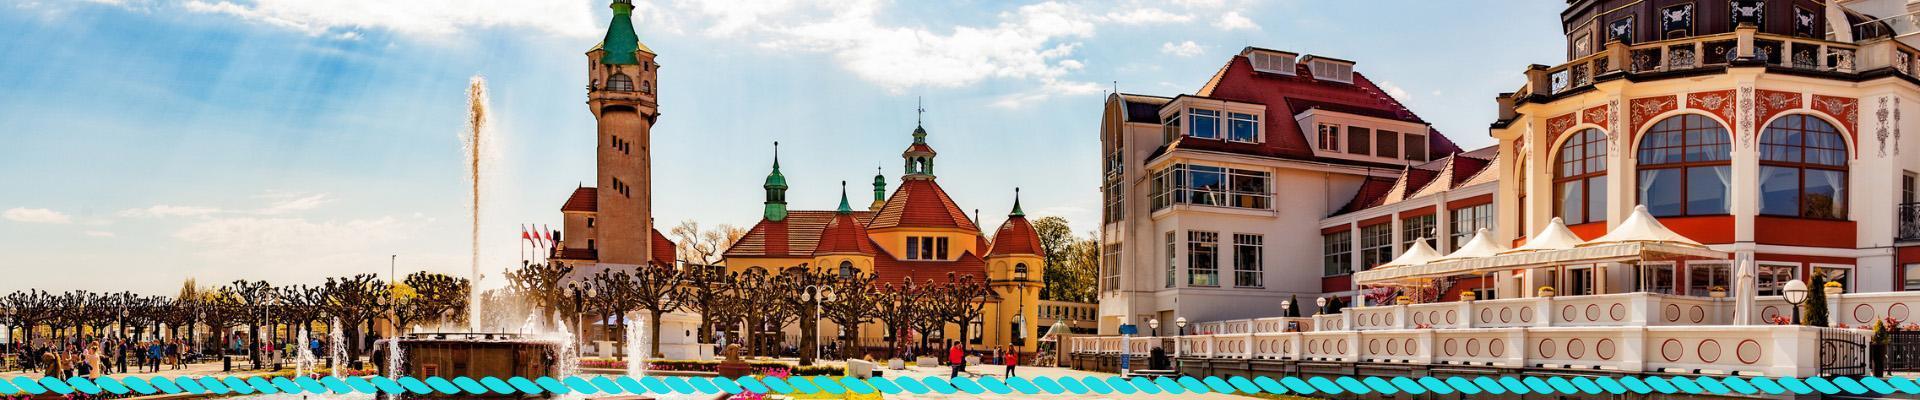 Fontanna w Sopocie